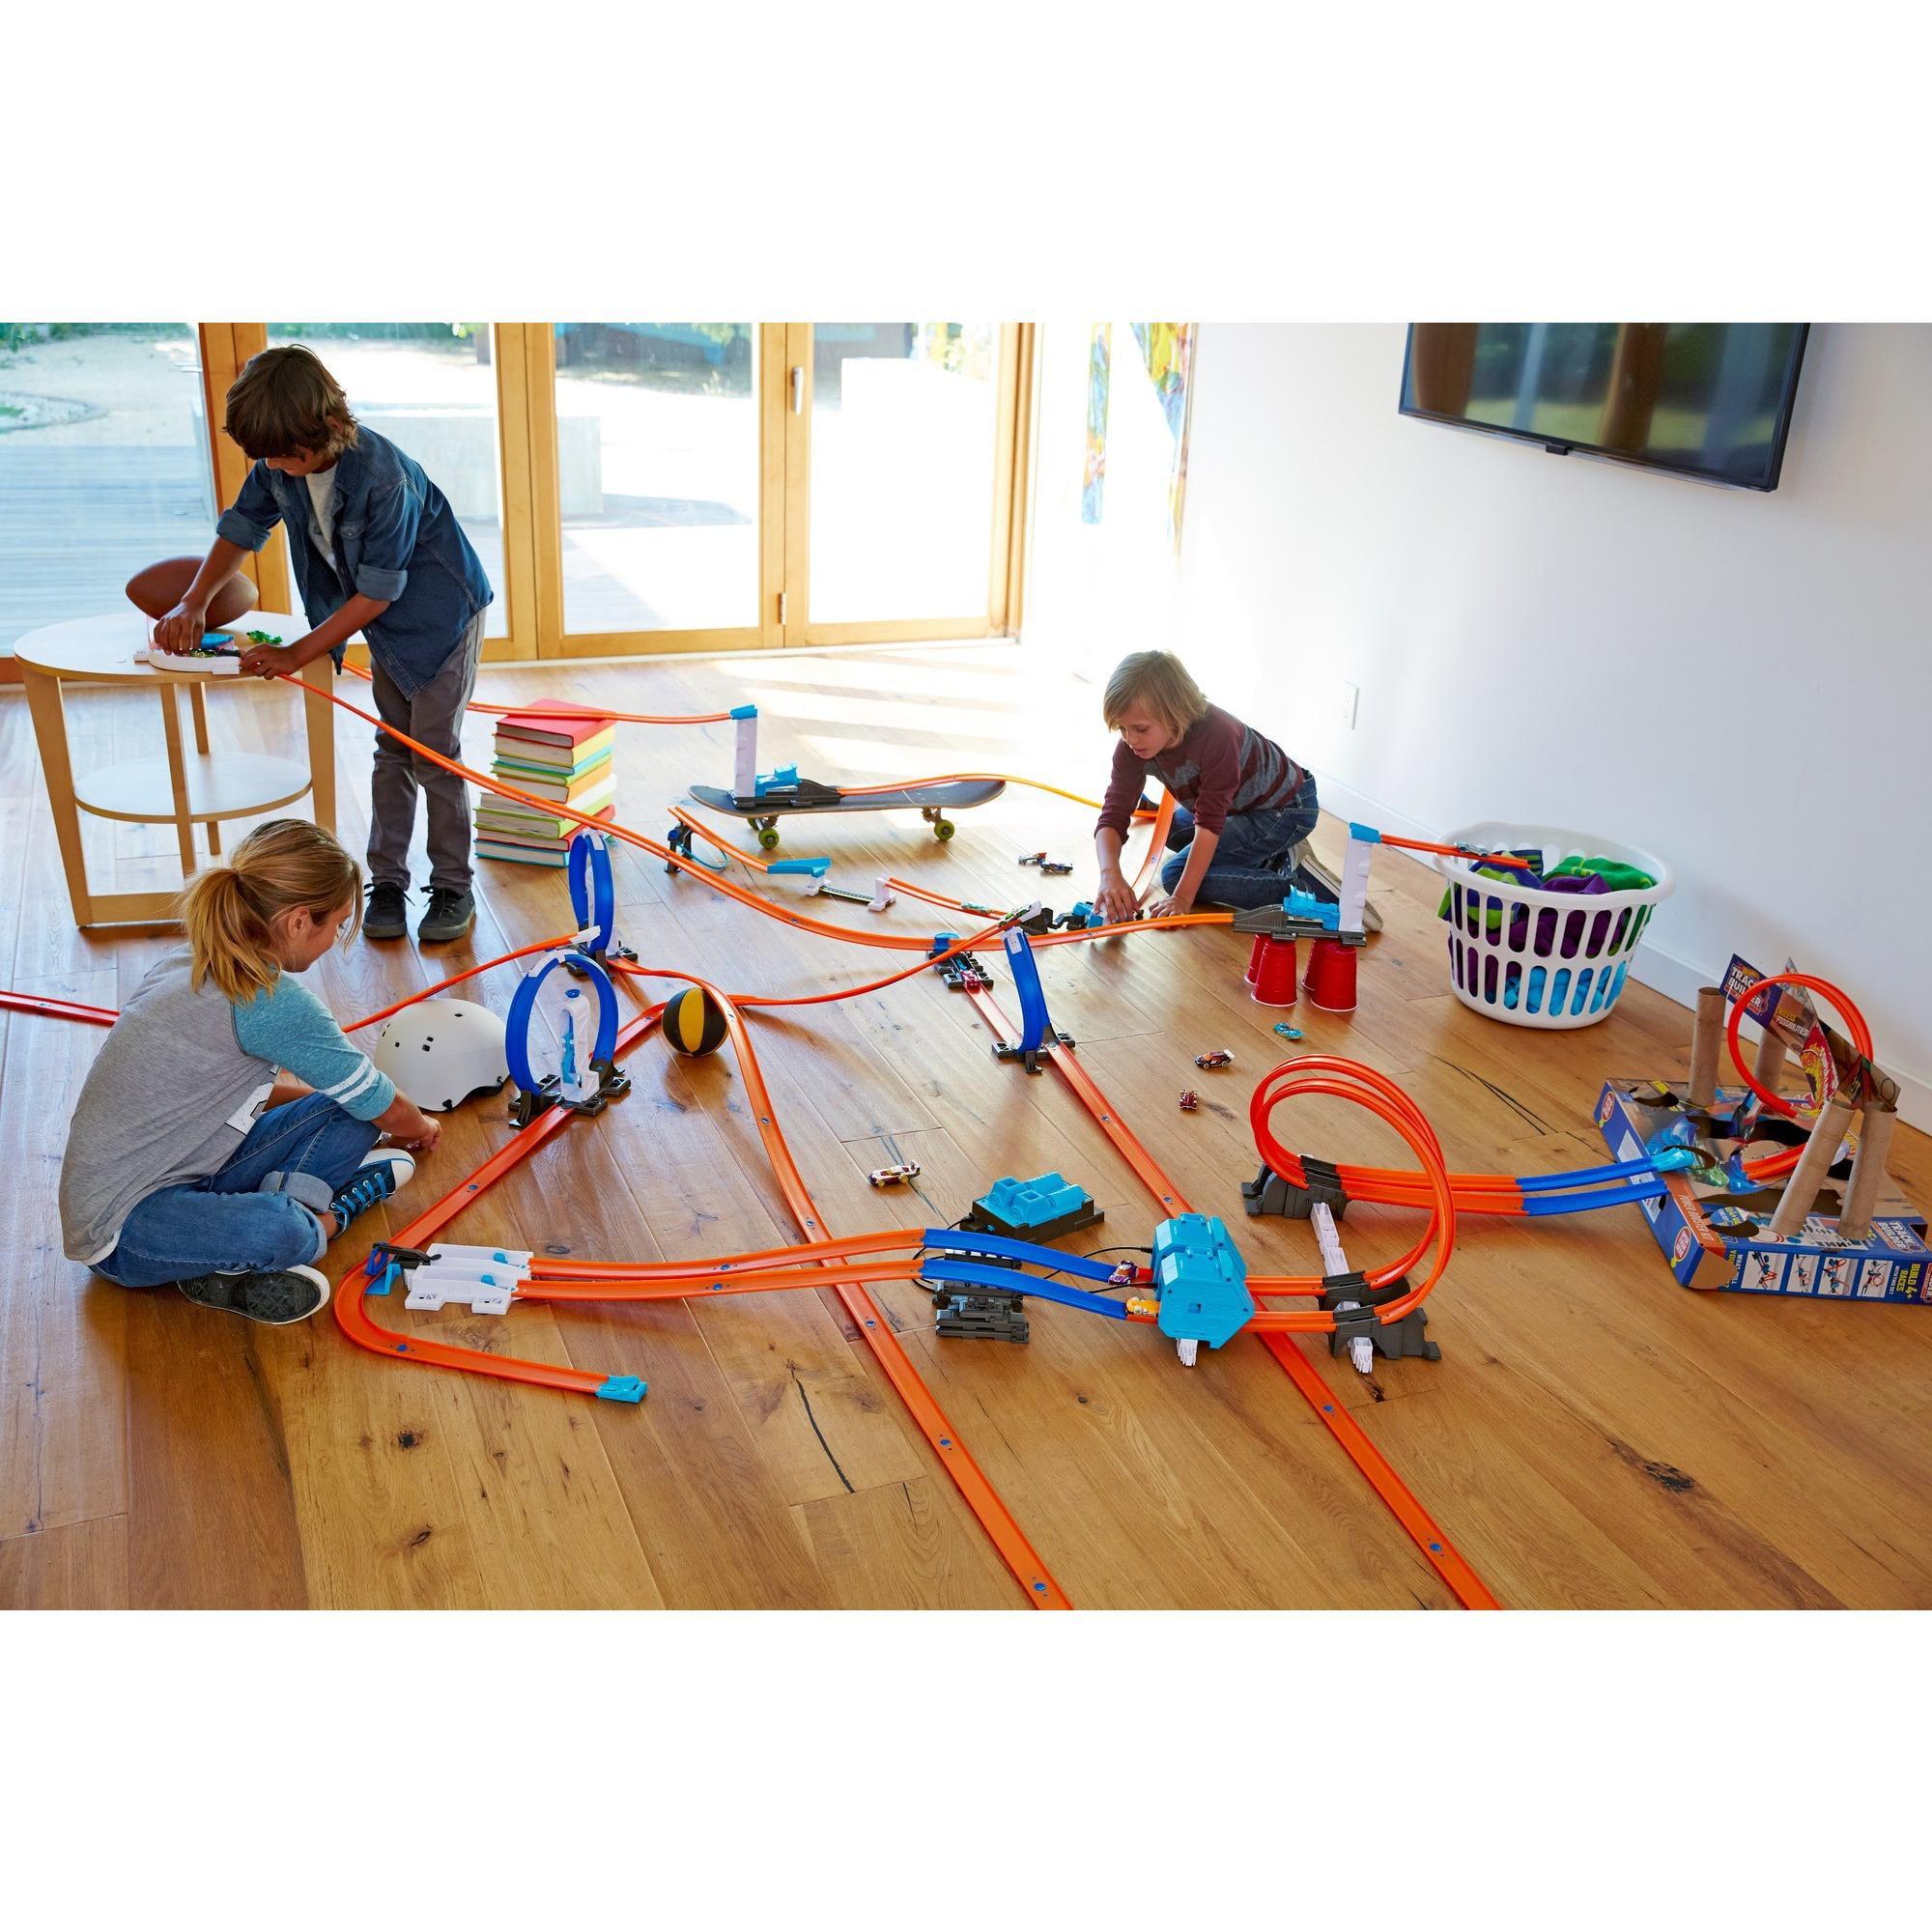 Hot Wheels Track Builder 2-Lane Launcher Trackset by Mattel